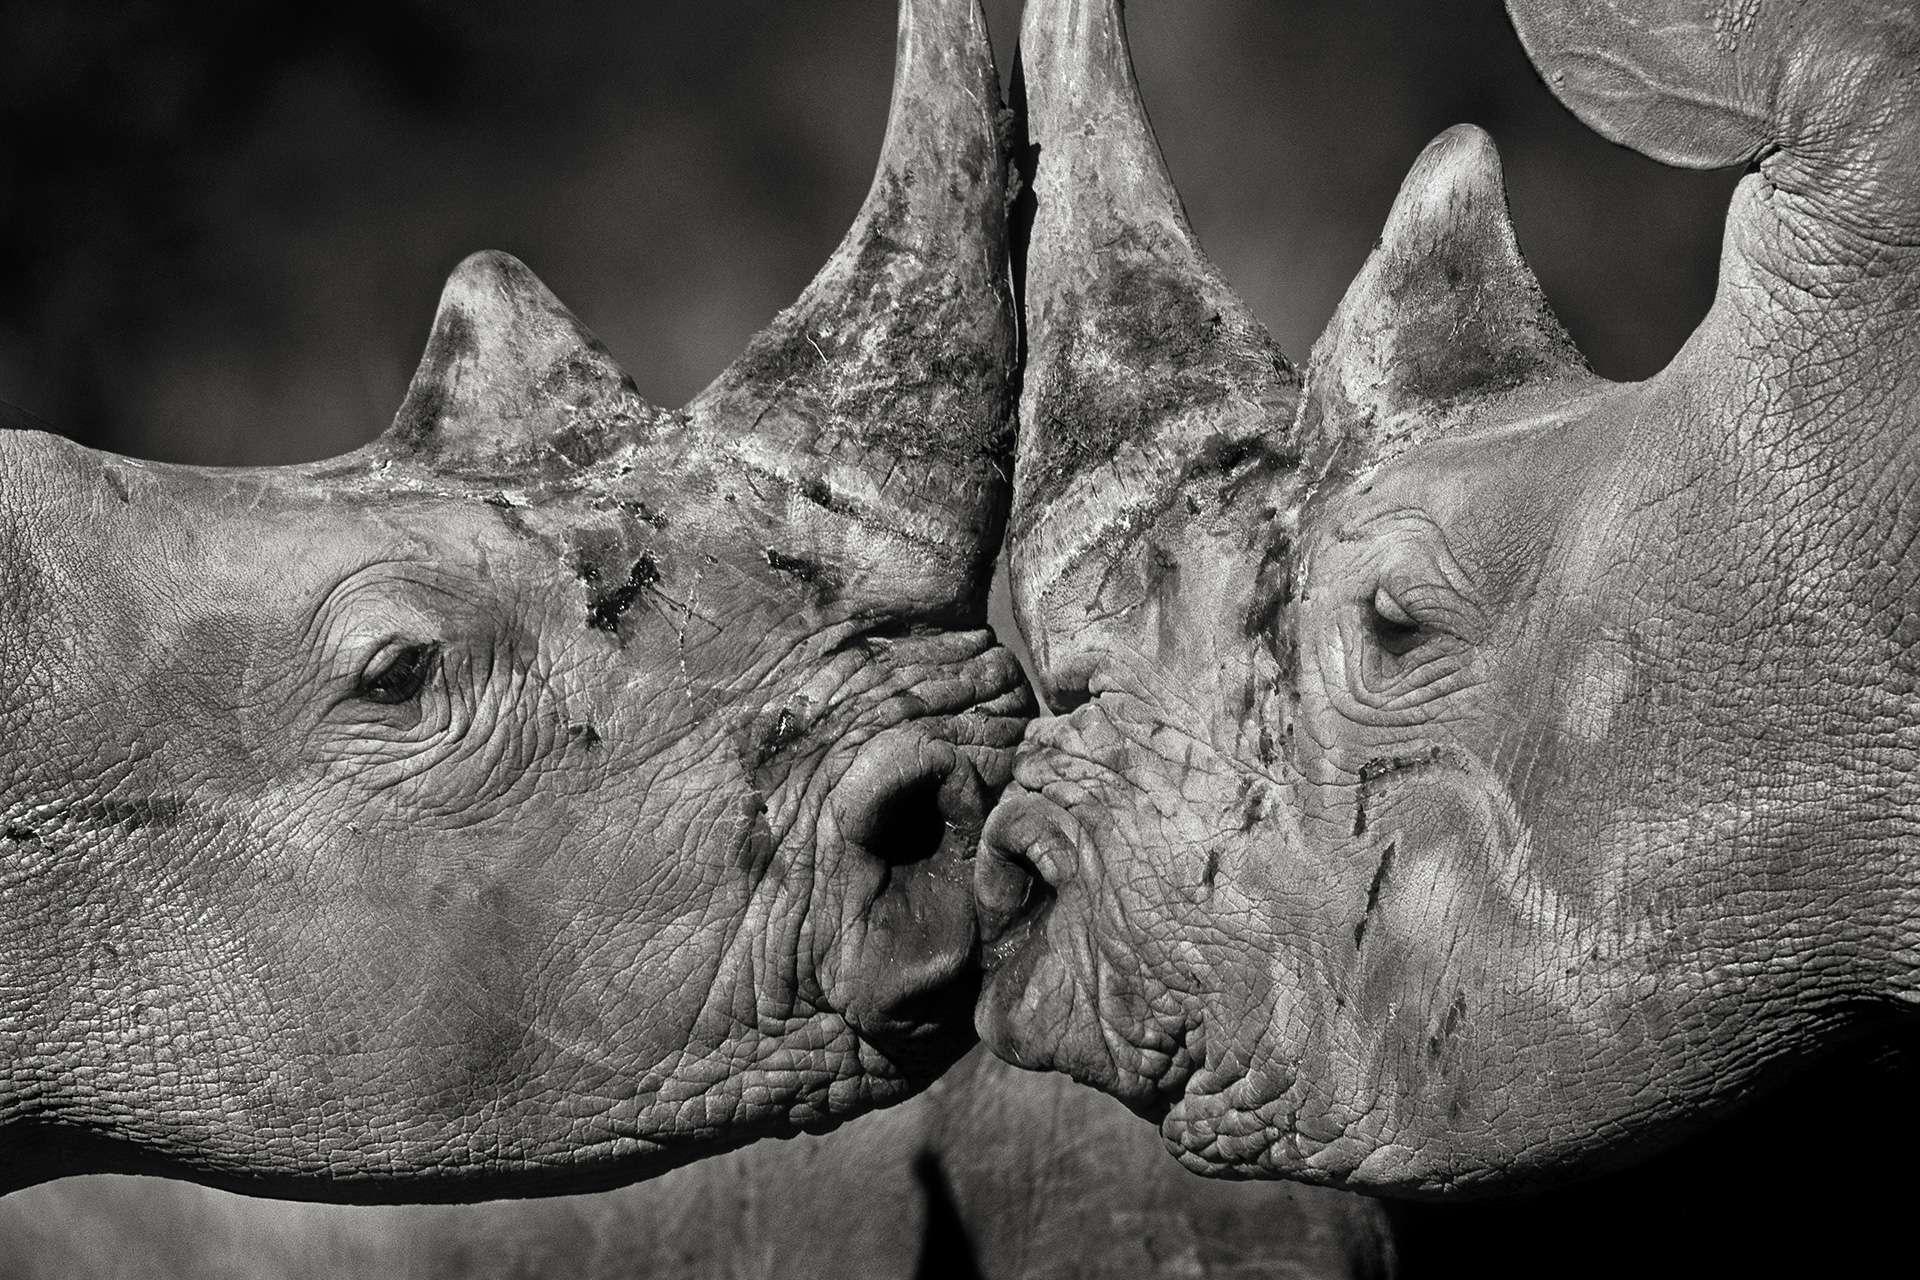 Rhinocéros blanc d'Afrique du sud, Struggle for life